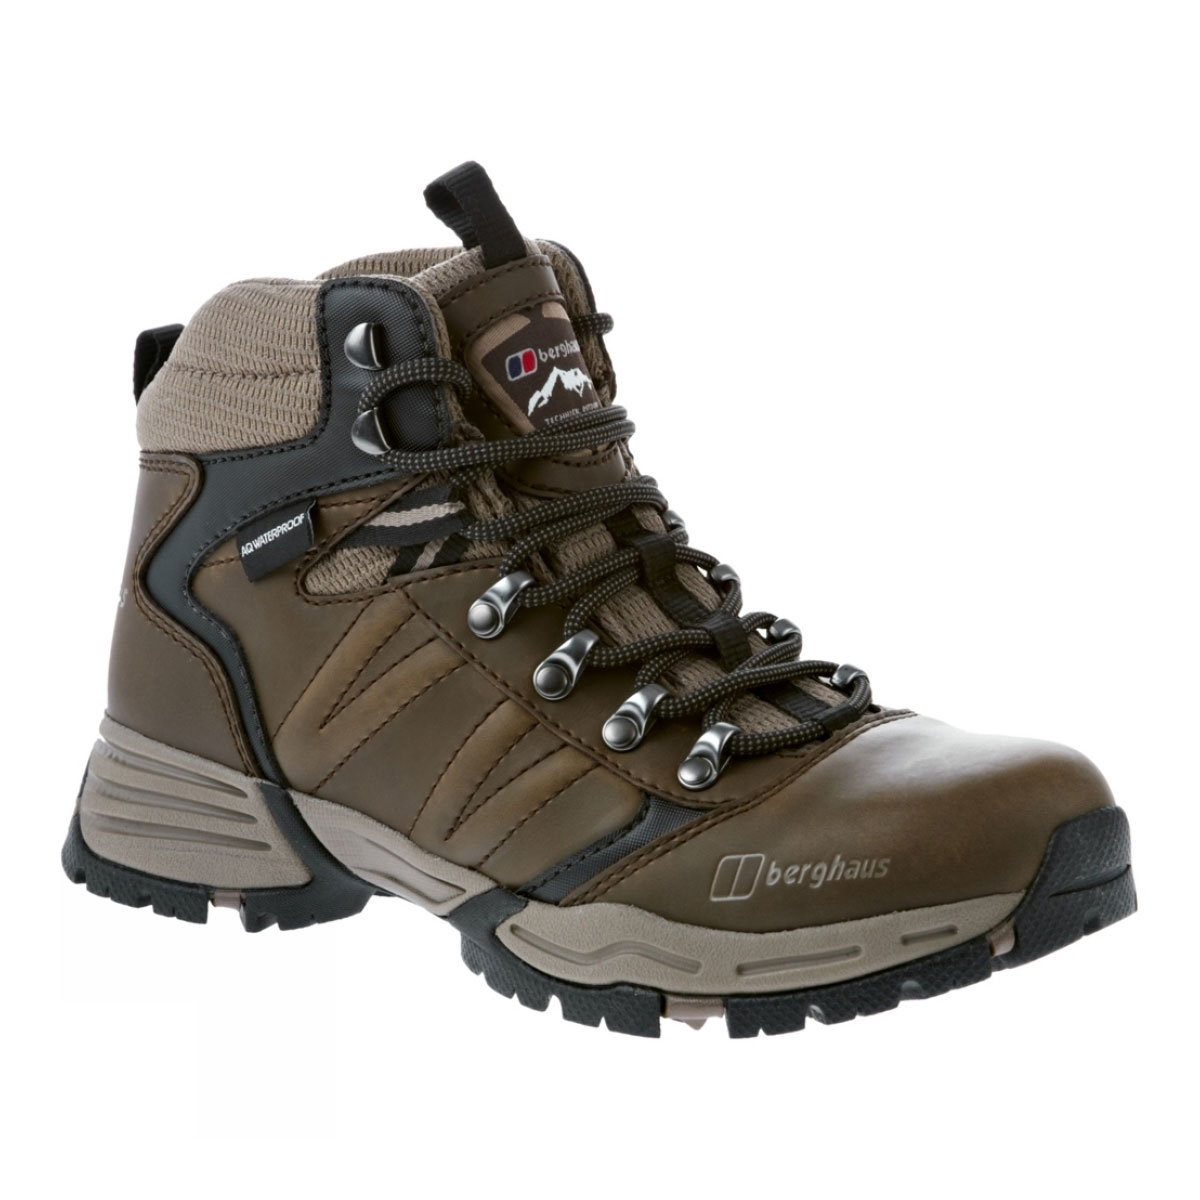 Image of Berghaus Expeditor AQ Leather Walking Boots (Women s) - Slate  Black   Walnut 05f6ac3fa